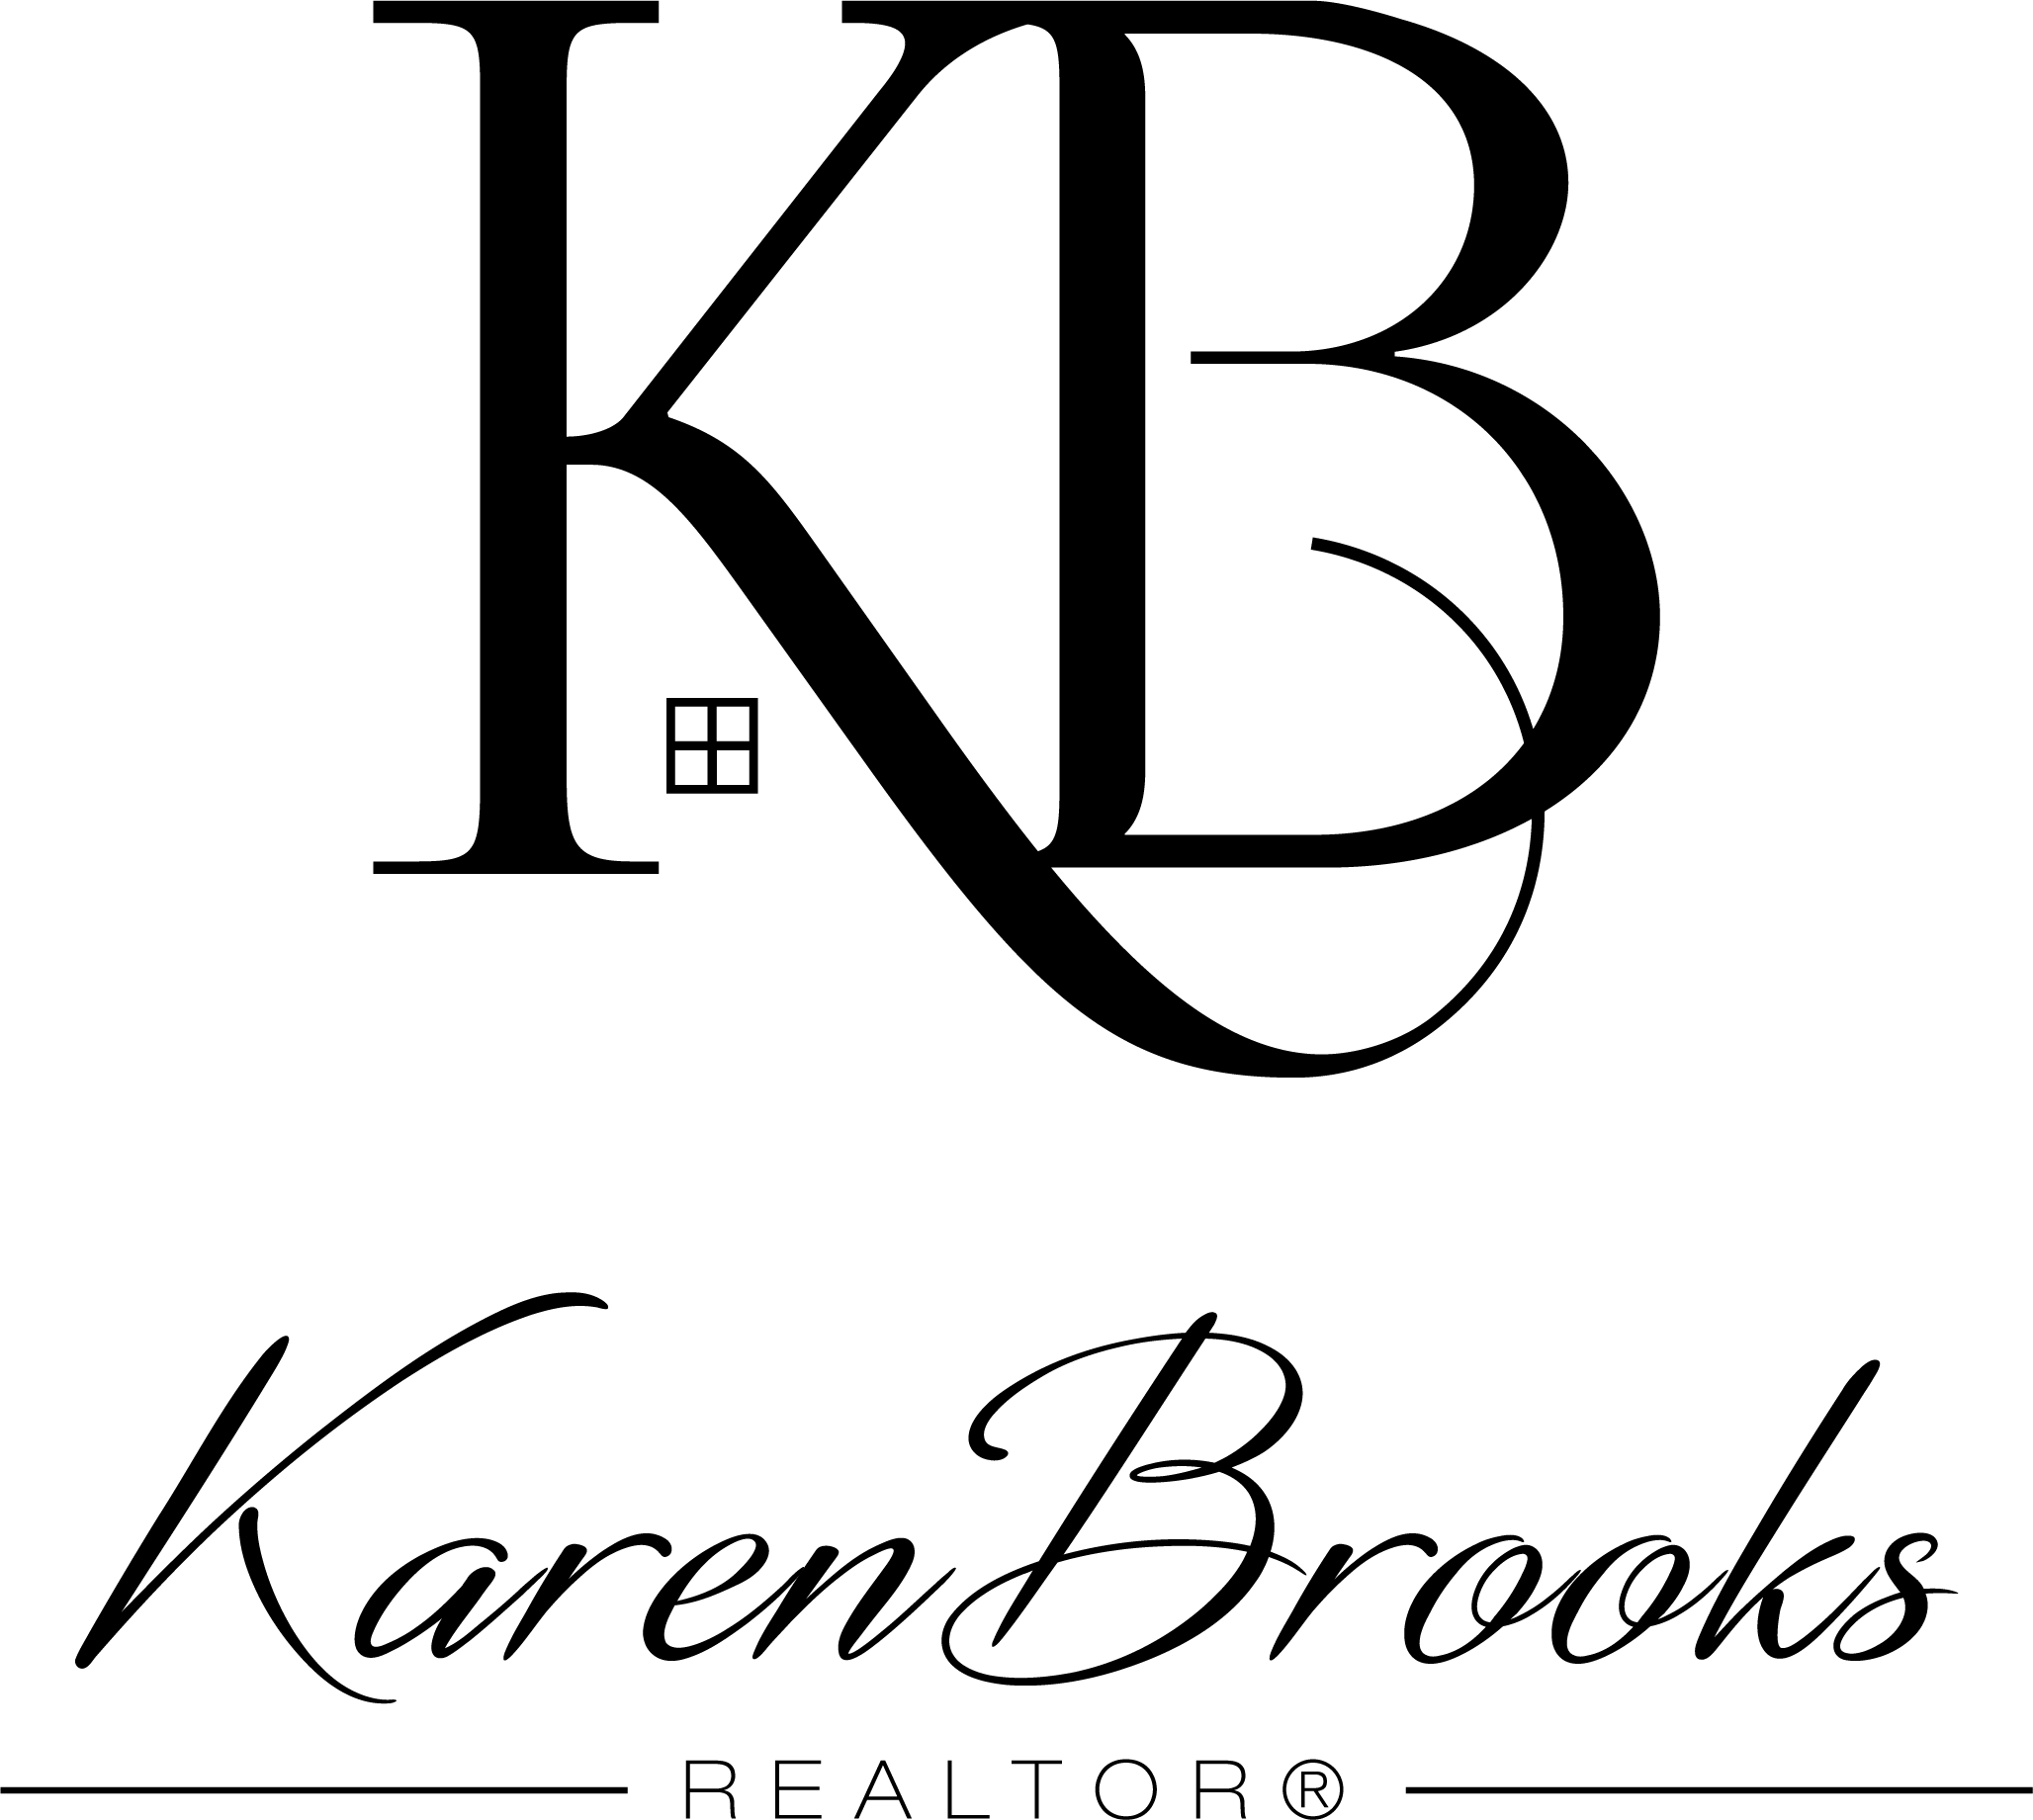 Top producing REALTOR needs standout logo